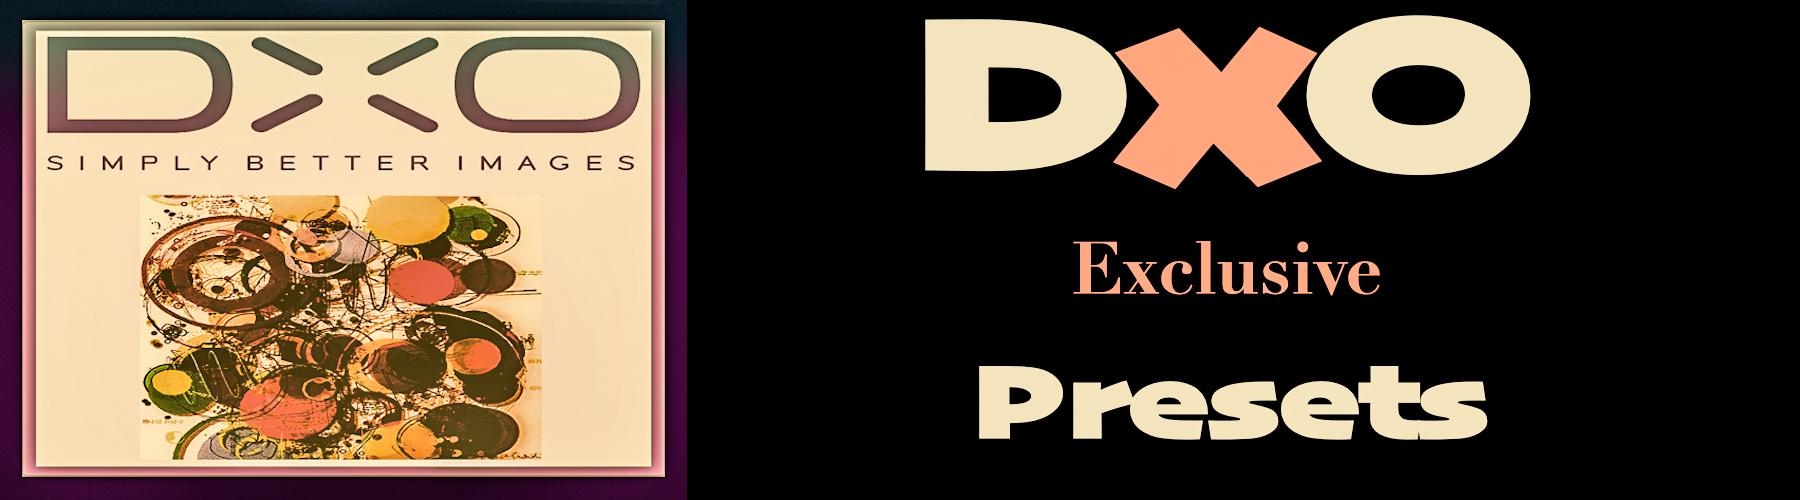 Premium and FREE DxO Presets from PixaFOTO.com